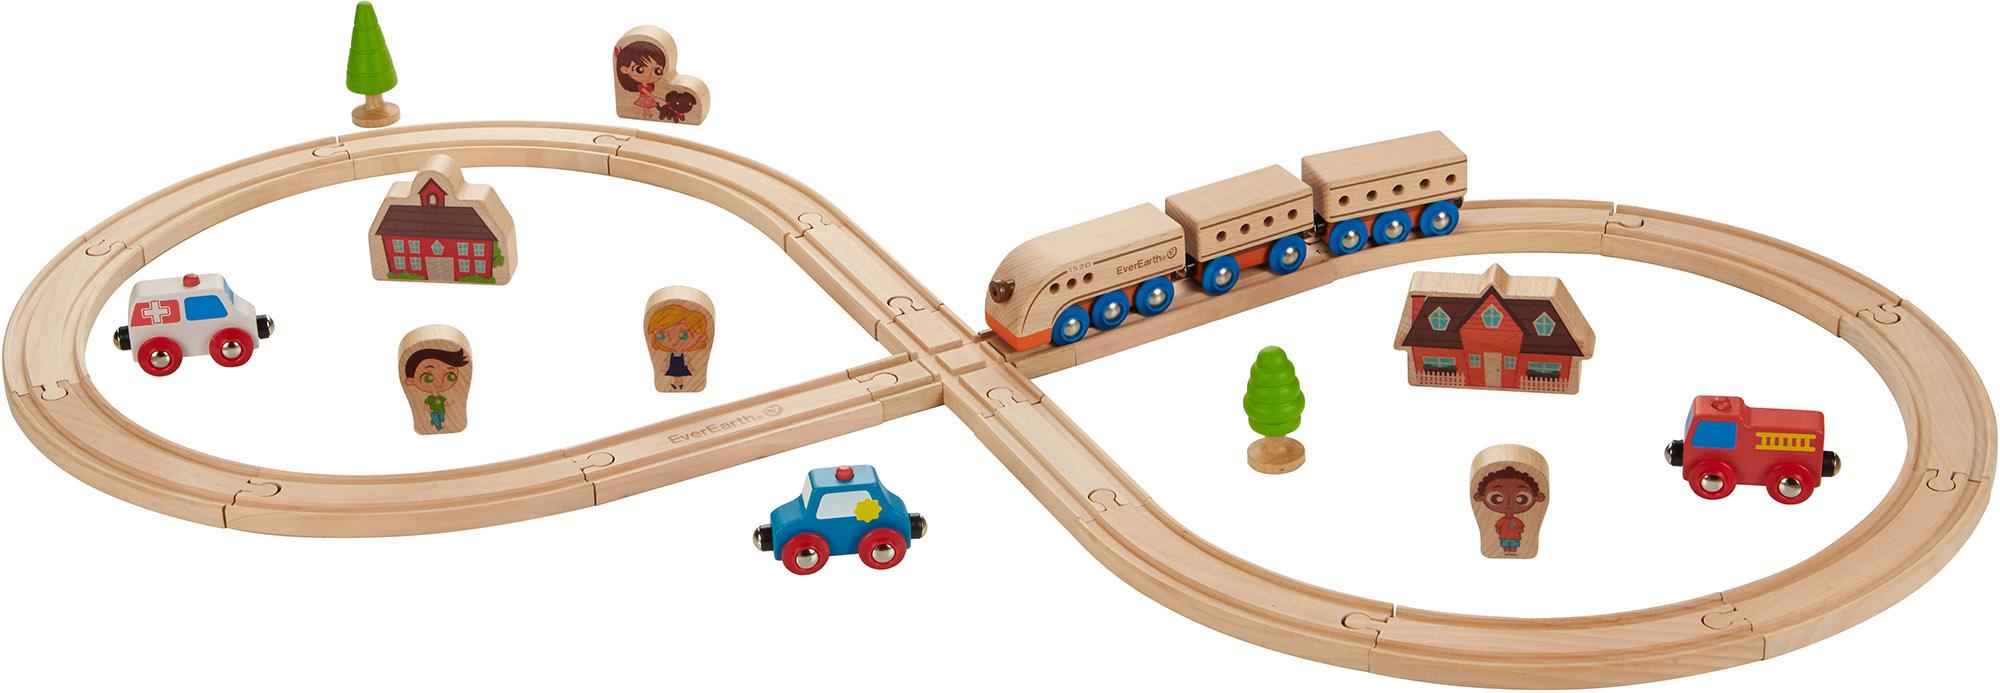 "EverEarth Spielzeug-Eisenbahn ""Eisenbahn-Set"" (Set 32-tlg) Technik & Freizeit/Spielzeug/Autos, Eisenbahn & Modellbau/Kindereisenbahnen"